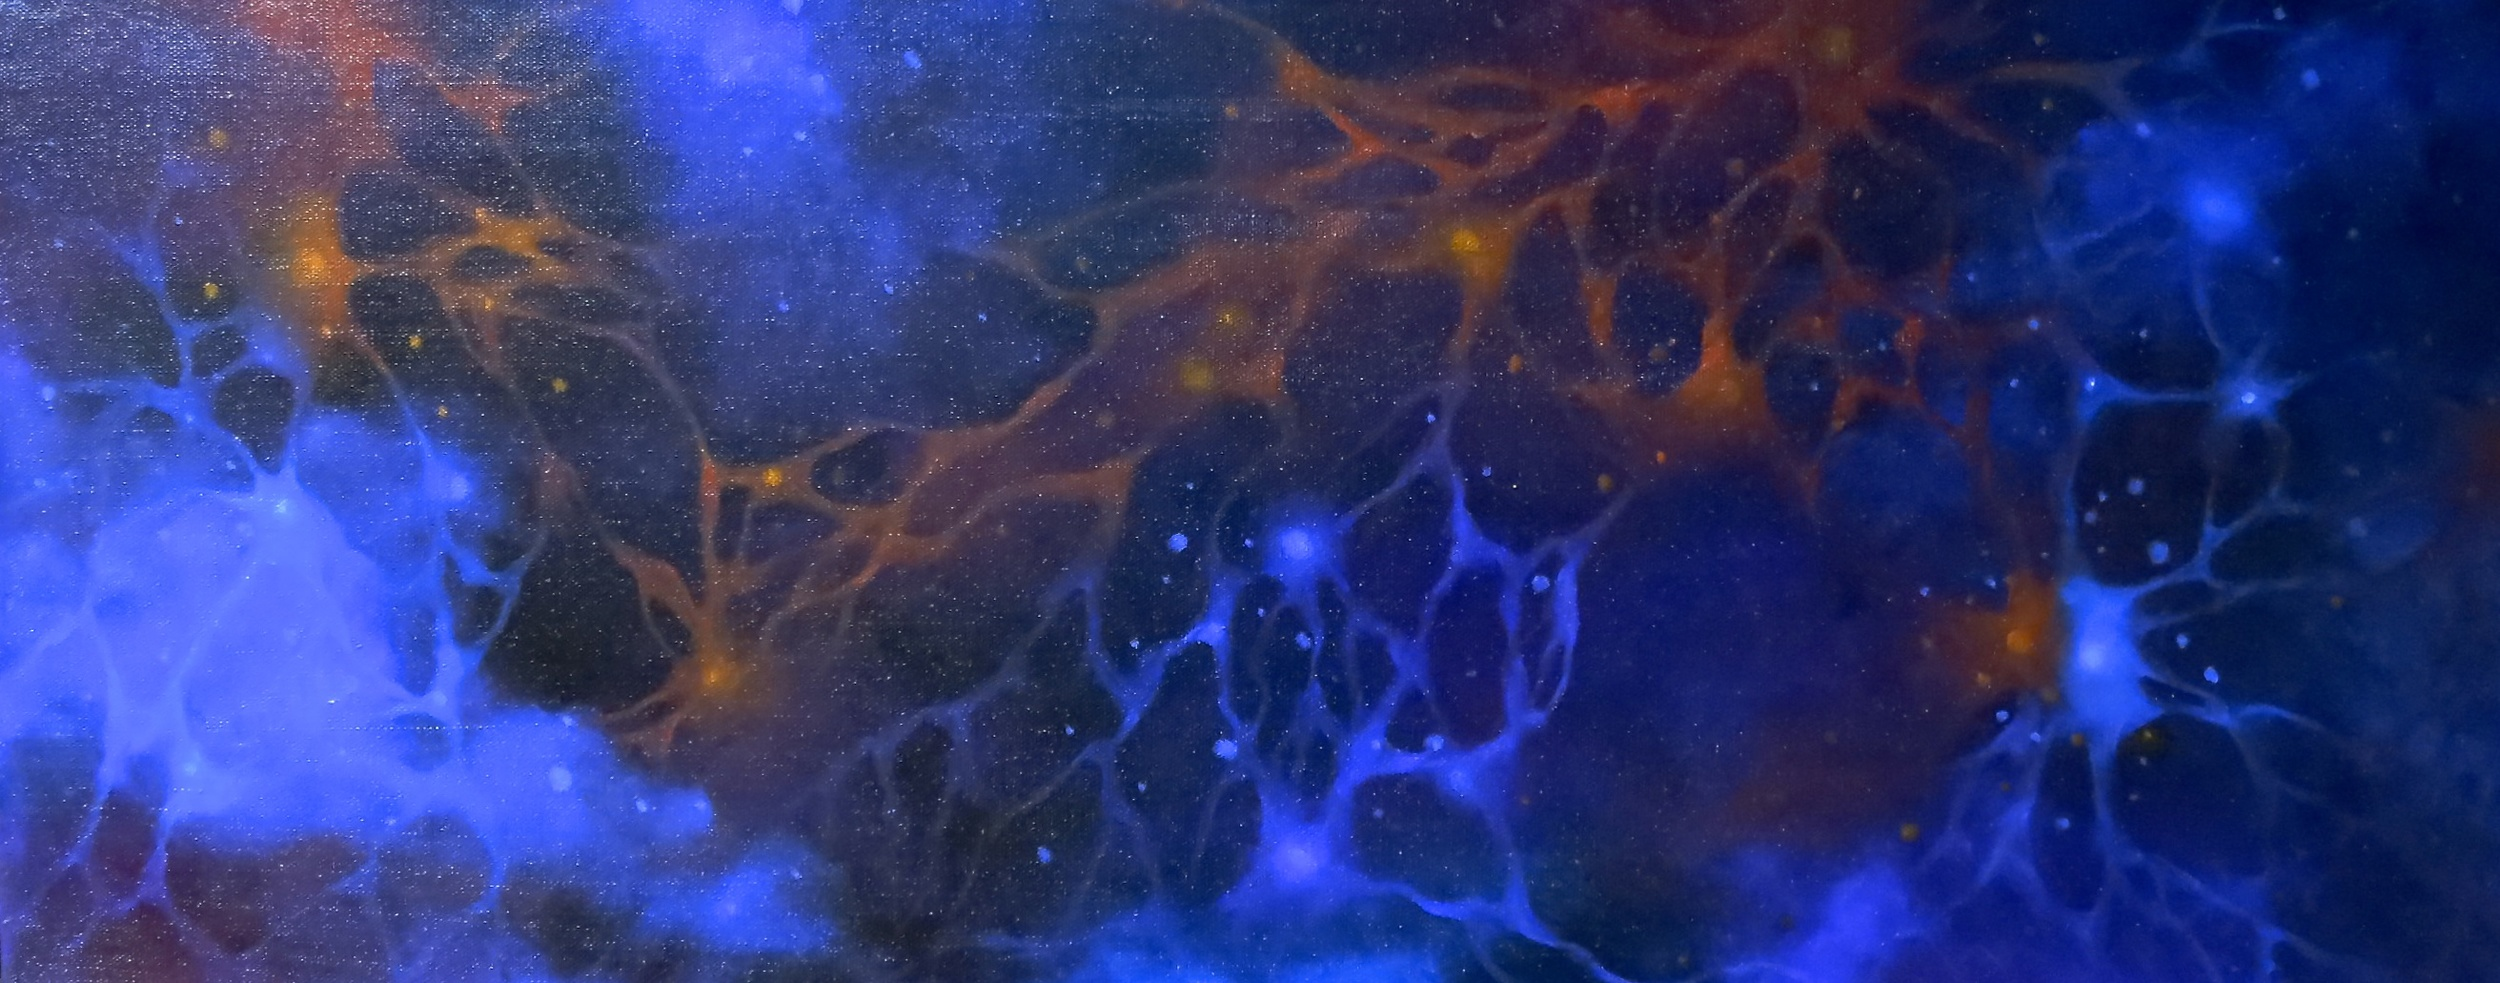 Celestial Synapses II